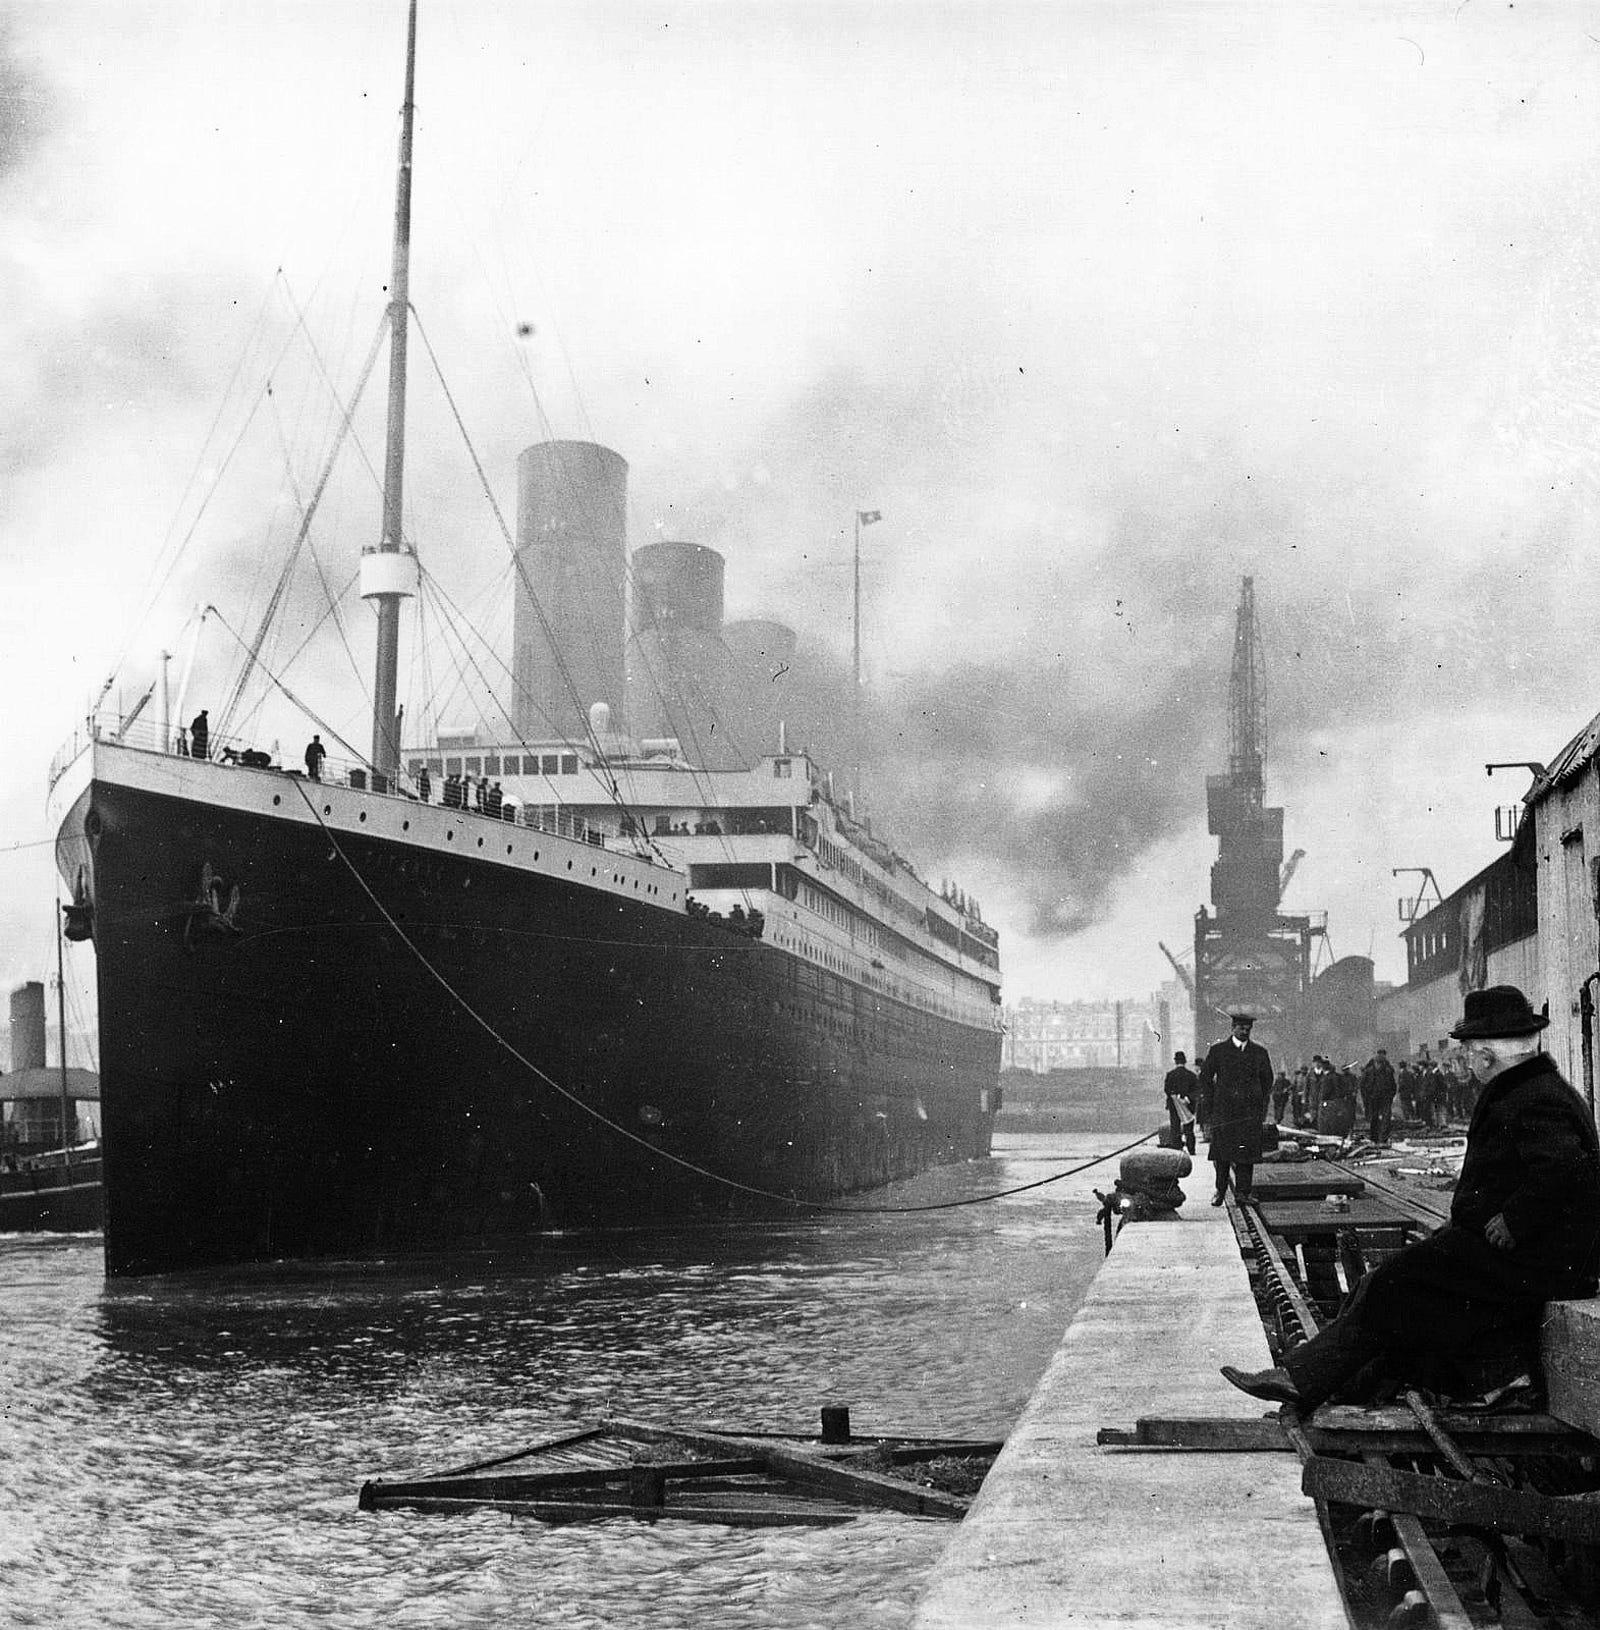 Robert Ballard y la verdadera historia del hallazgo del Titanic